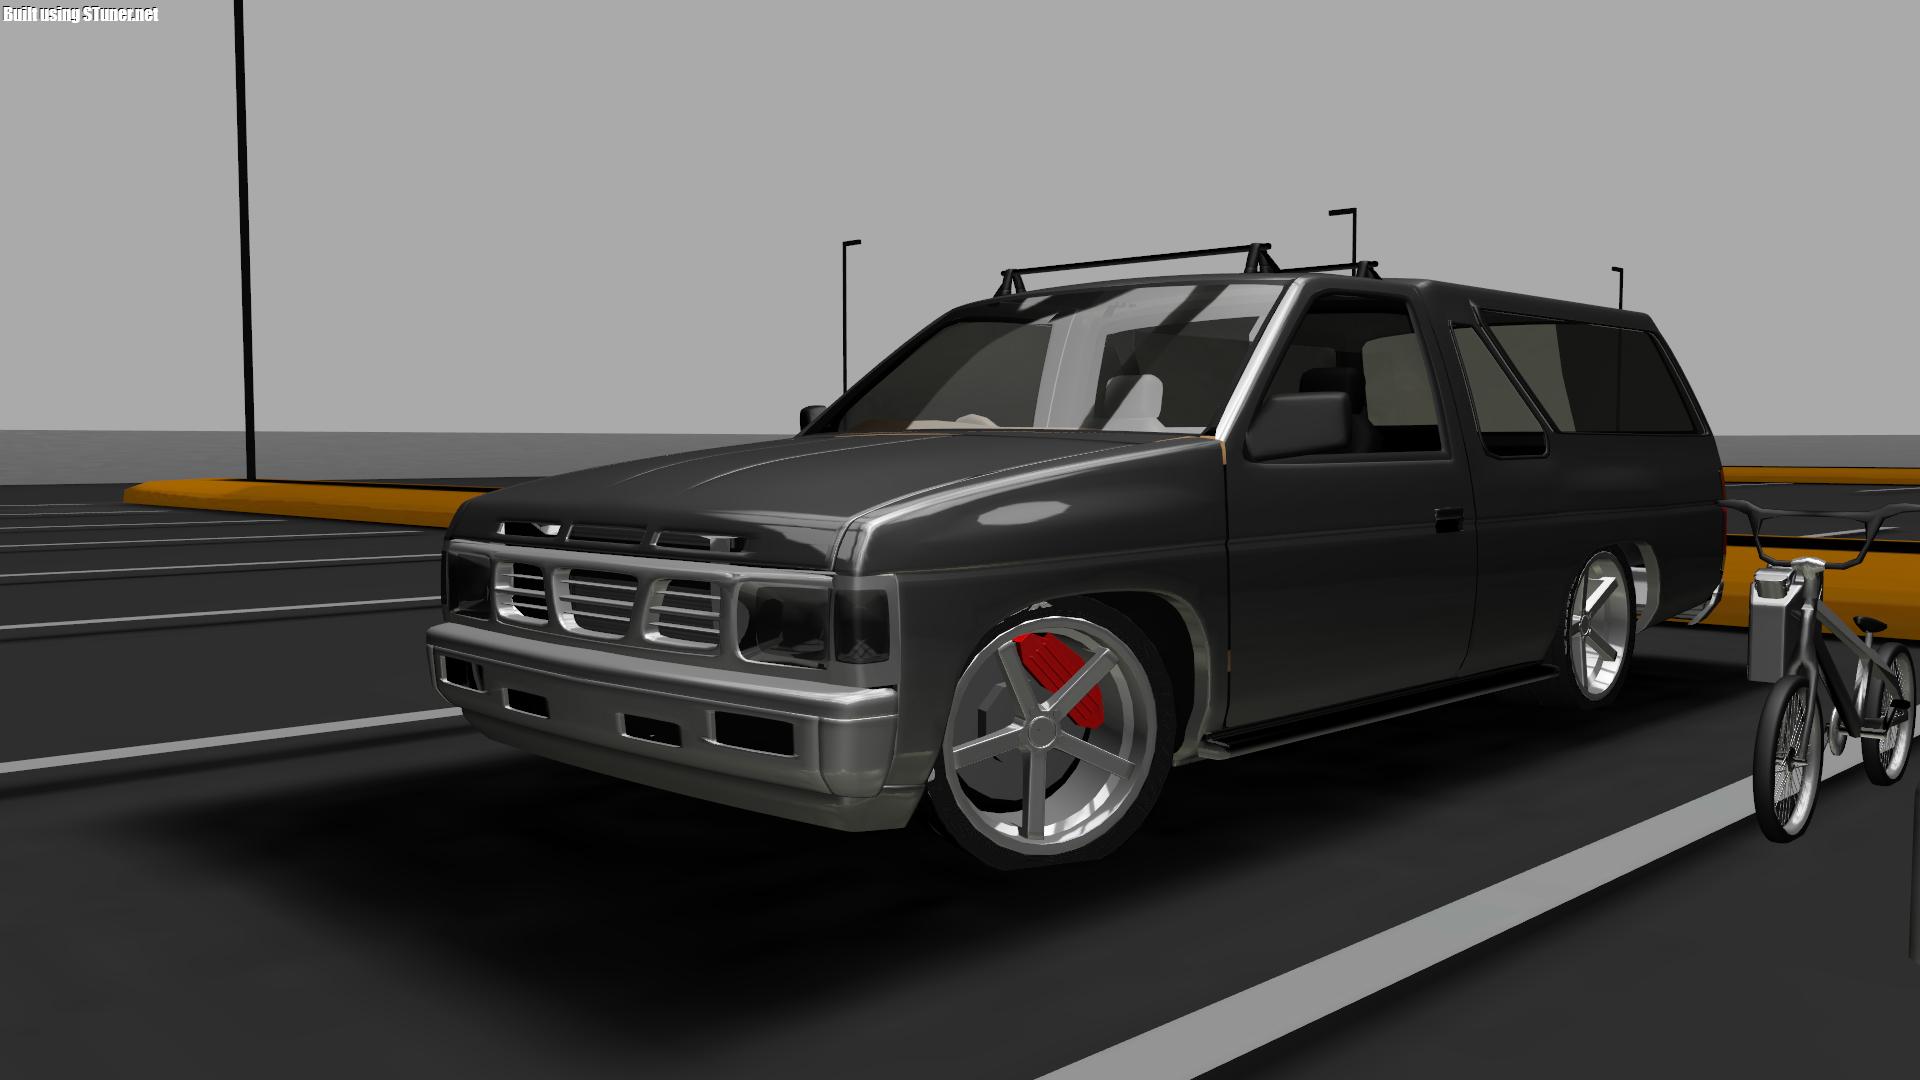 Stuner net Cars | BeamNG